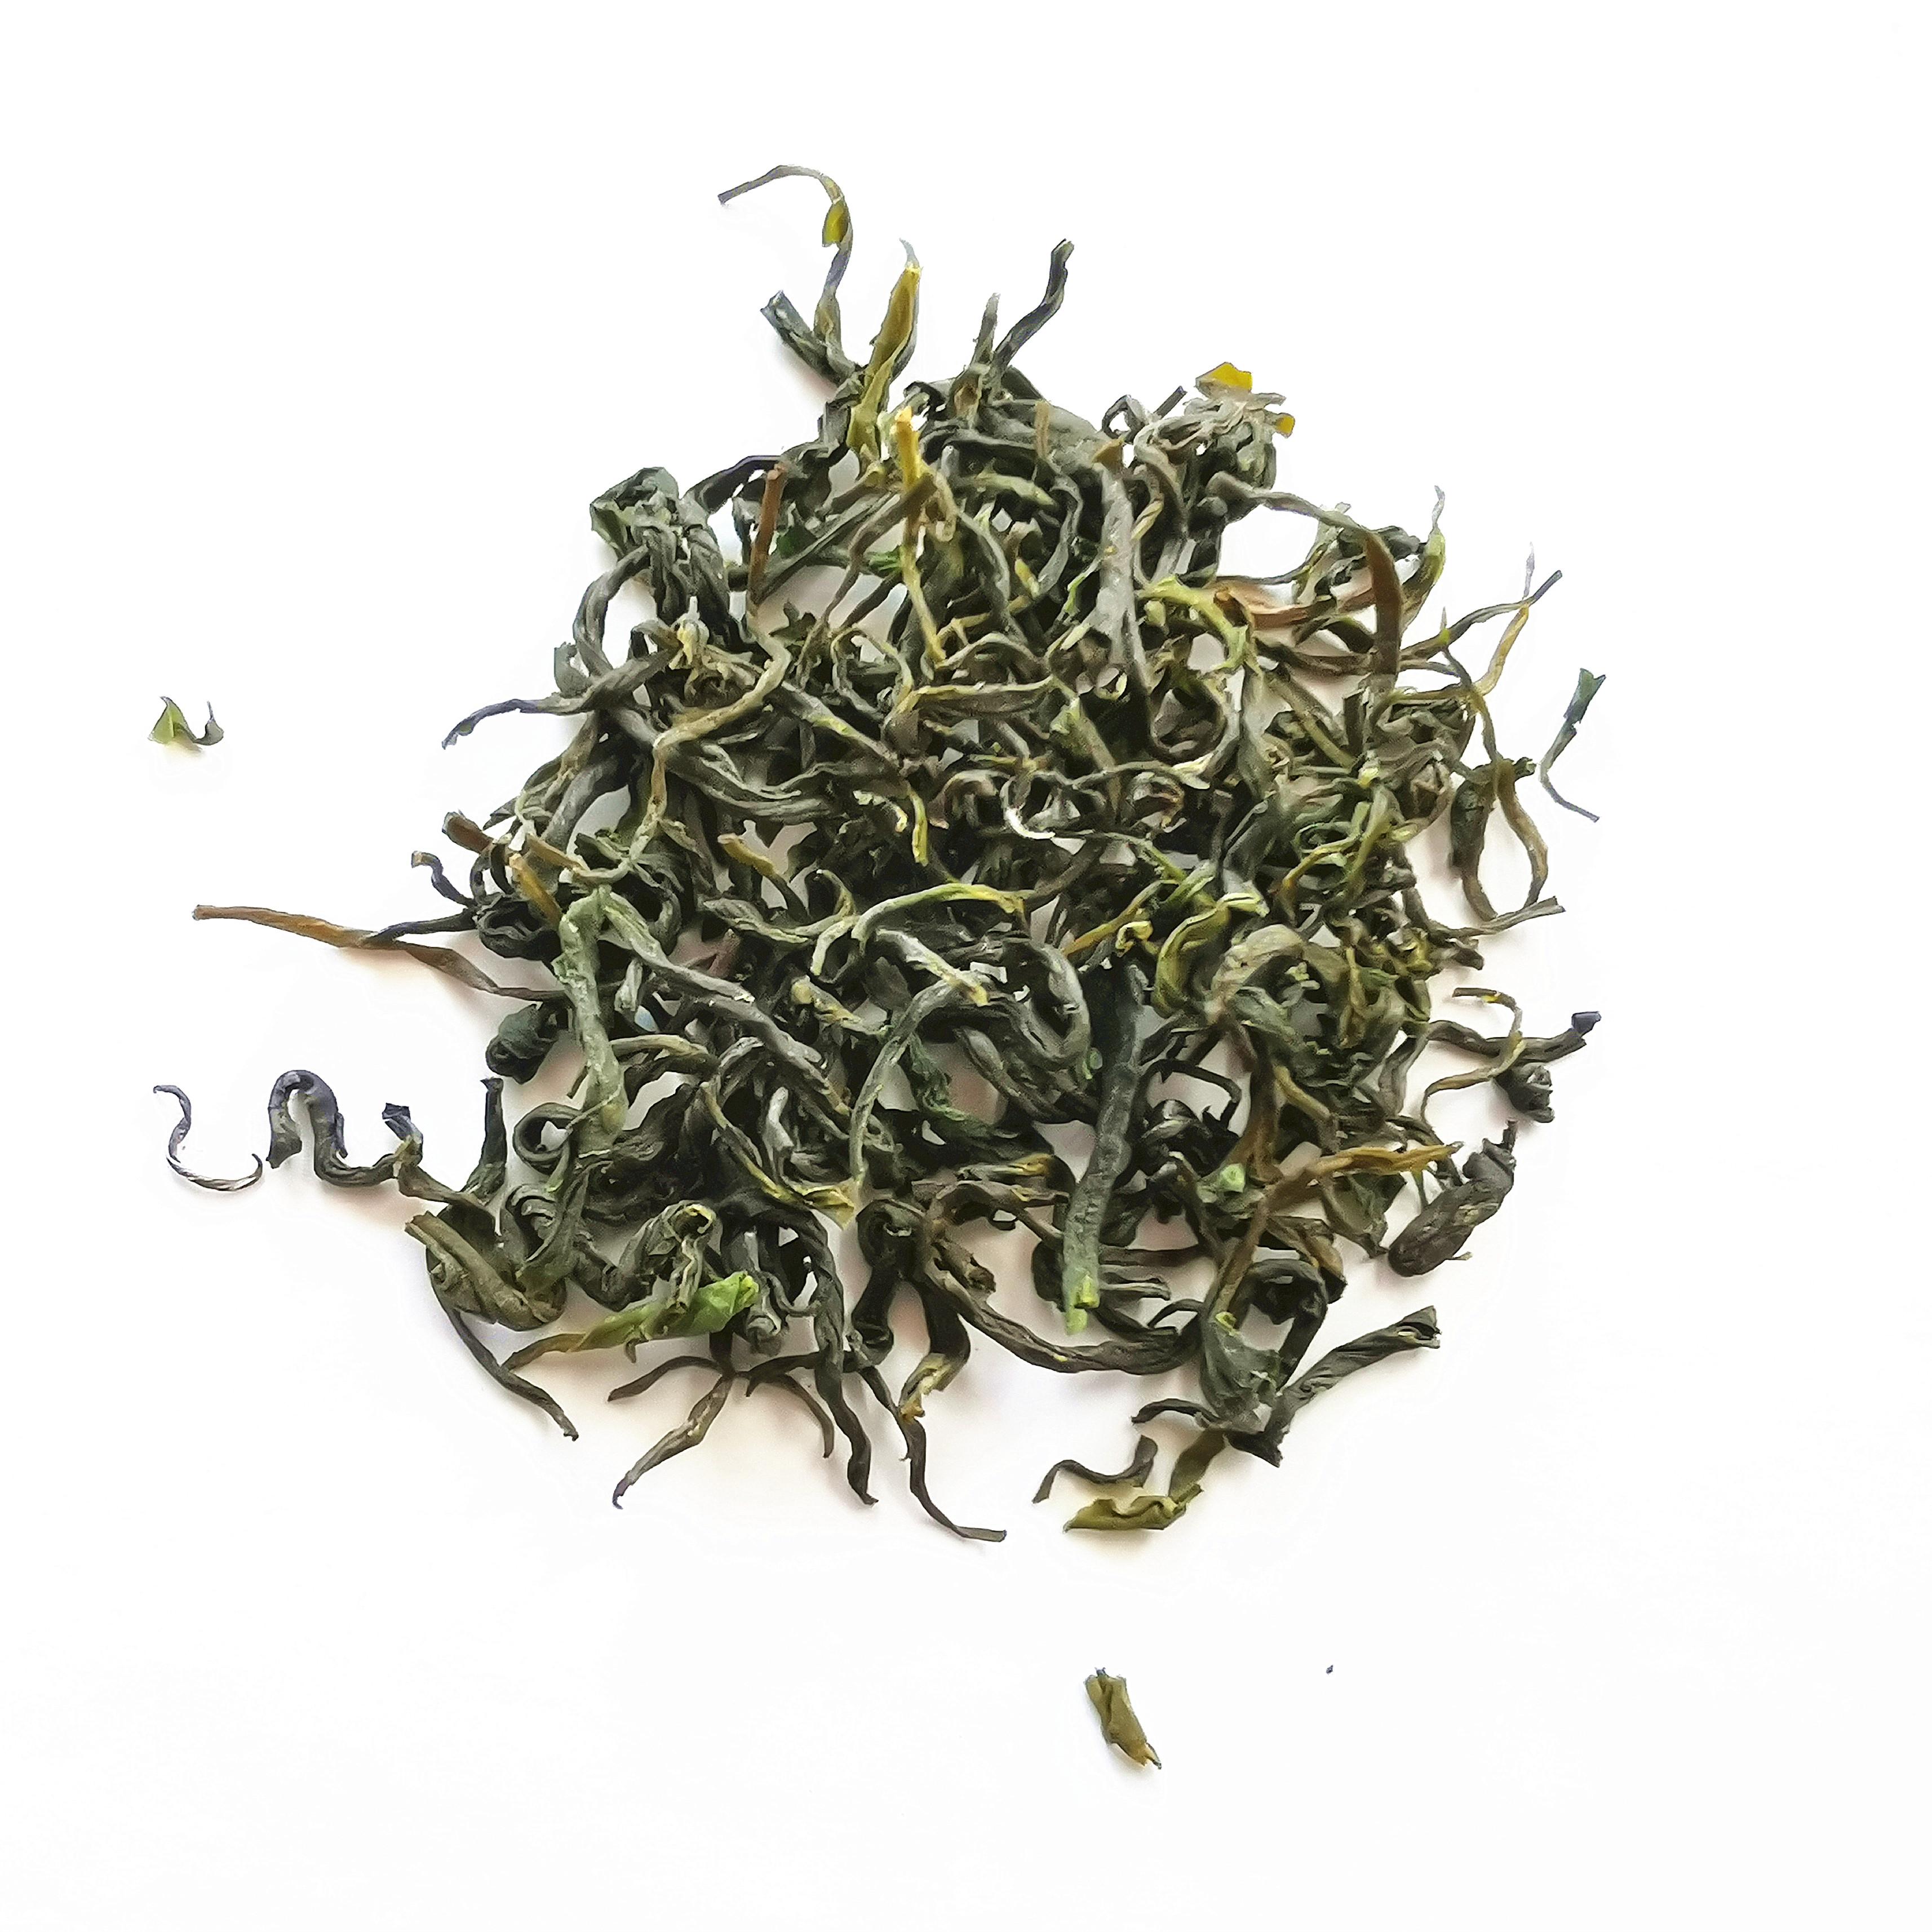 Famous brand detox drink tea health organic tea green - 4uTea | 4uTea.com